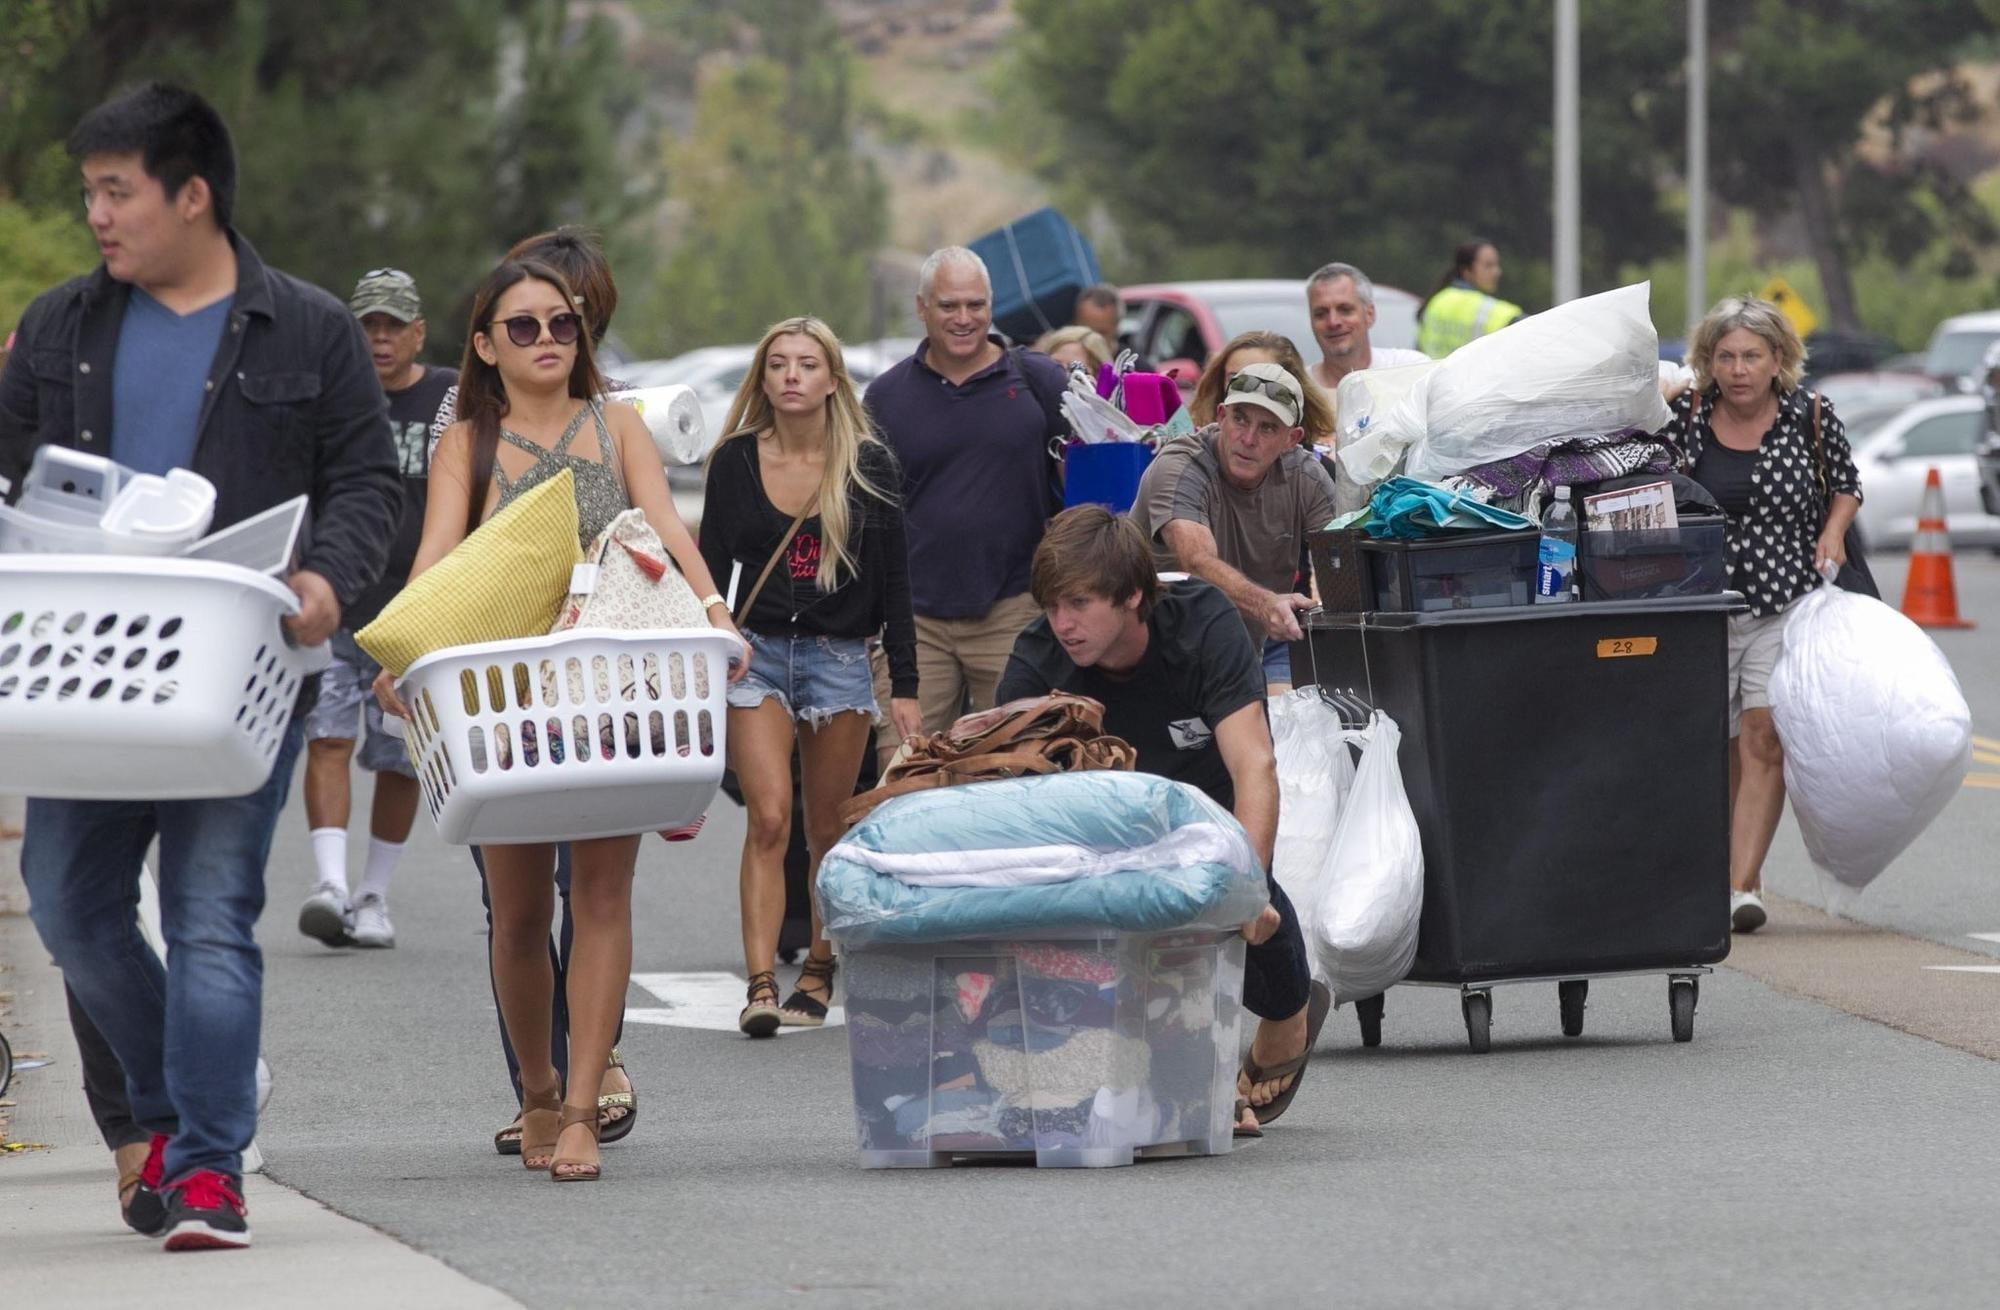 San Diego approves first 'hybrid dormitory' near SDSU to alleviate housing scarcity